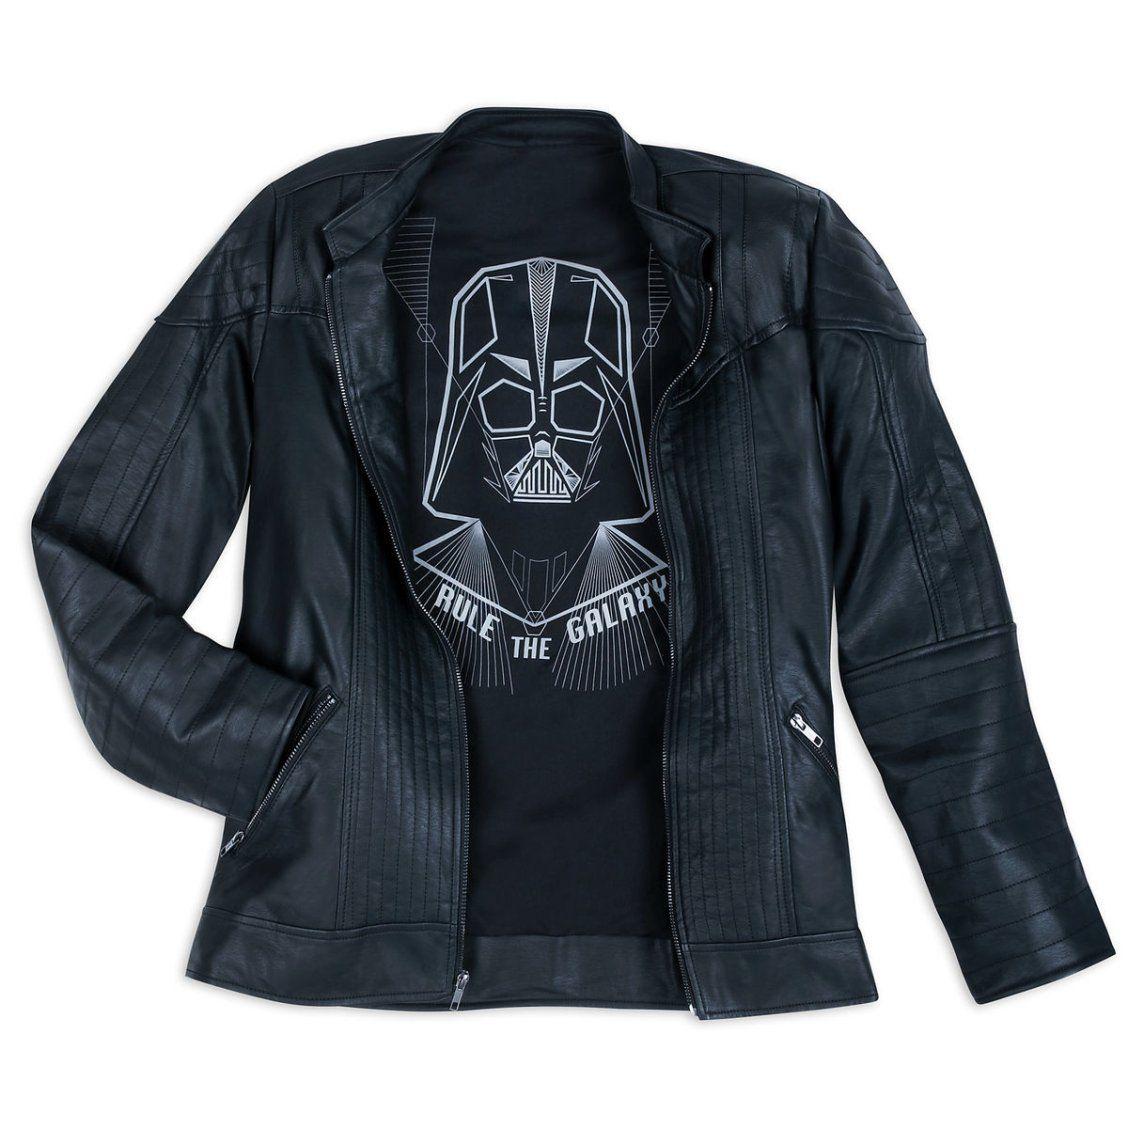 Darth Vader Racer Jacket for Men by Our Universe Star Wars